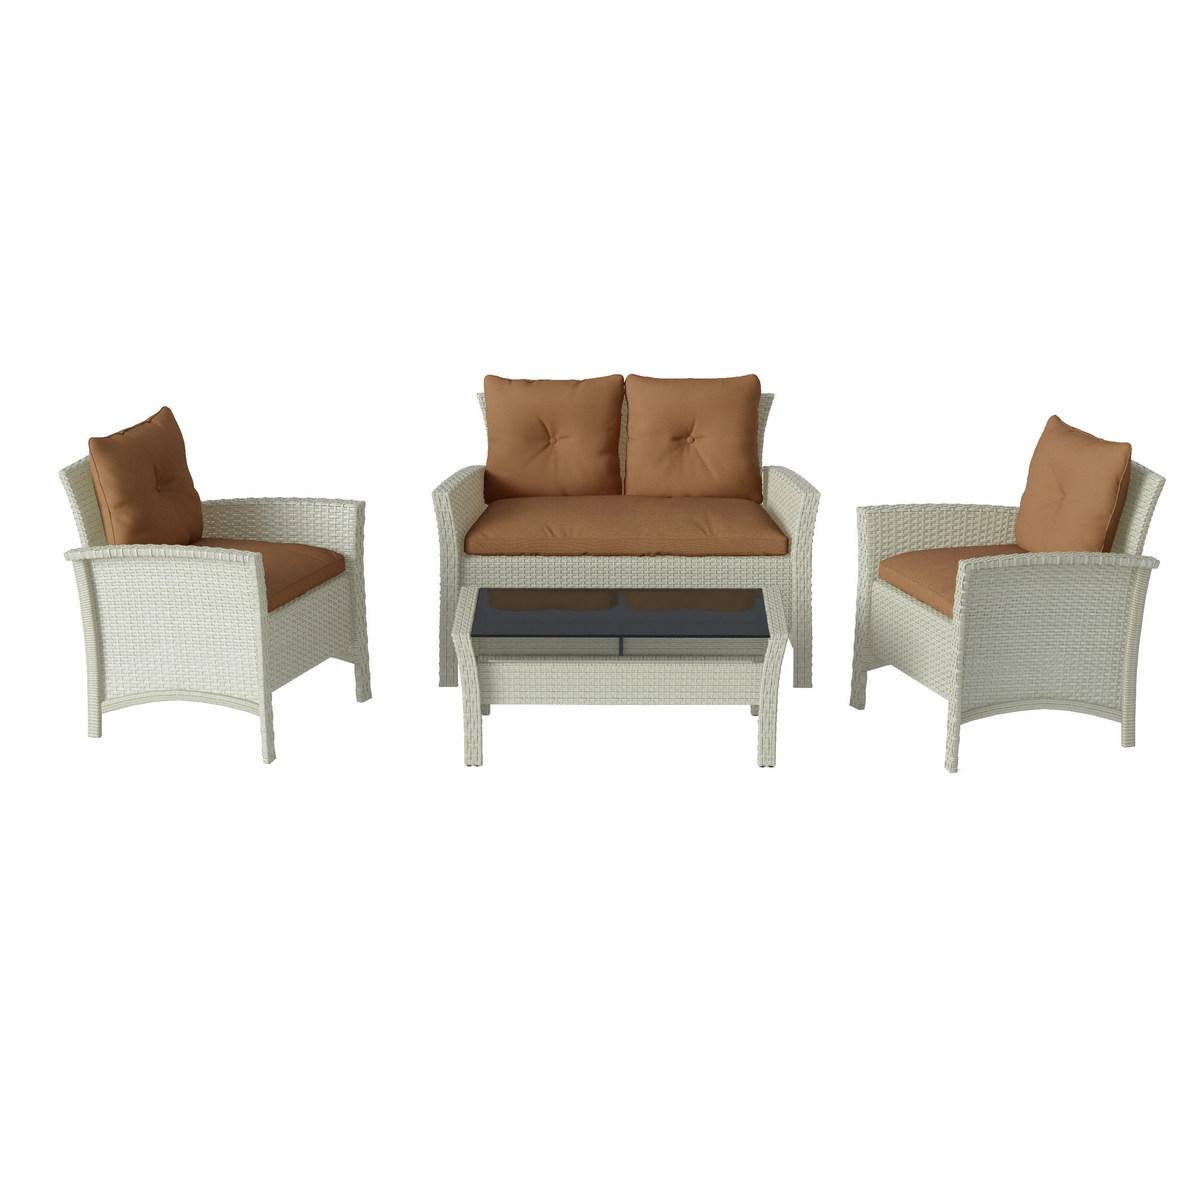 Corliving Distressed Grey Resin Rattan Wicker Patio Set Brown Cushions